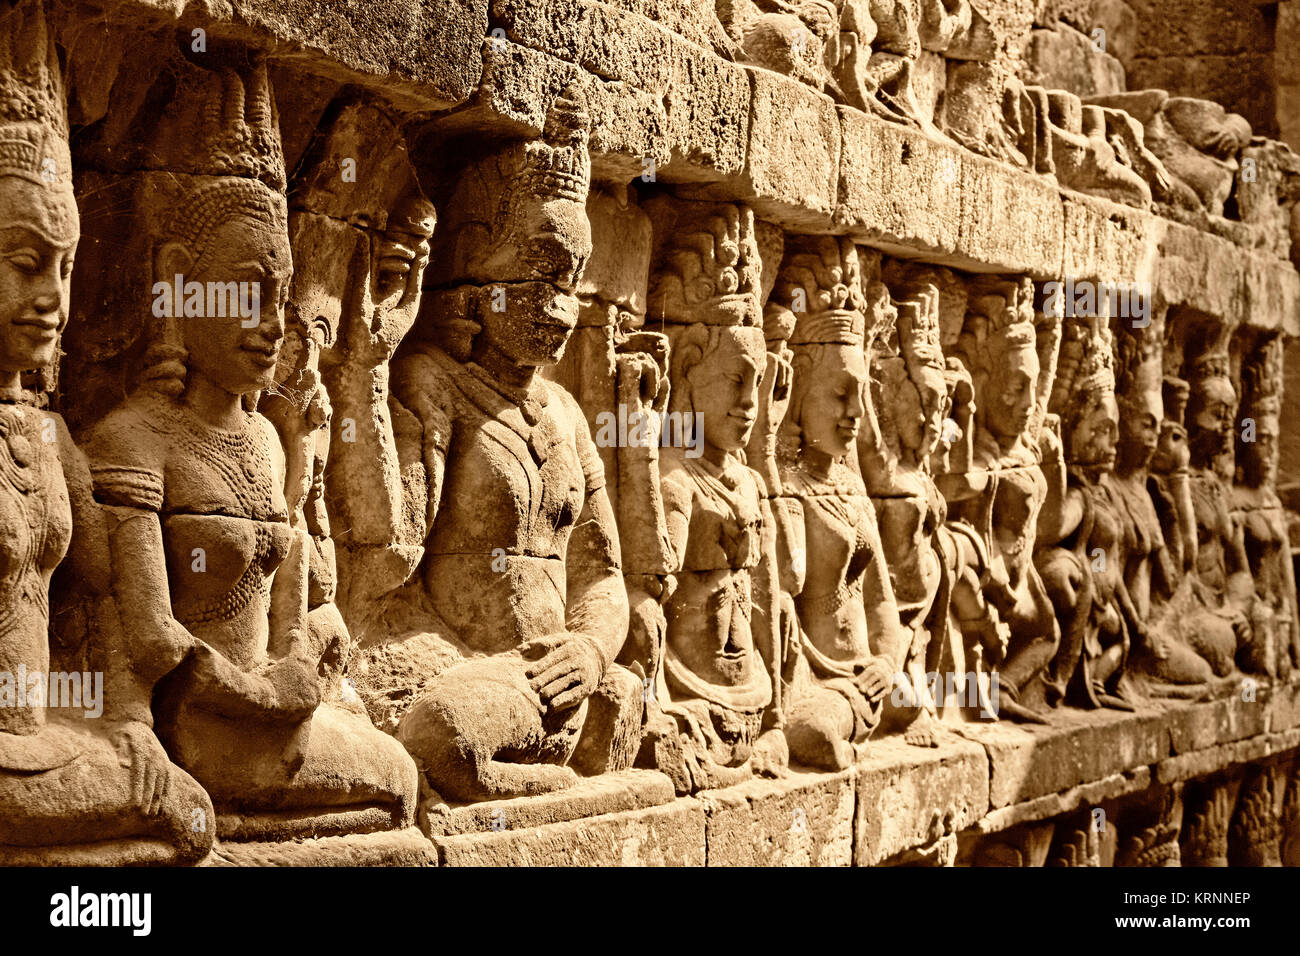 Terasse von Lepra König, Angkor Thom Tempel, Kambodscha, Asien, Stockbild